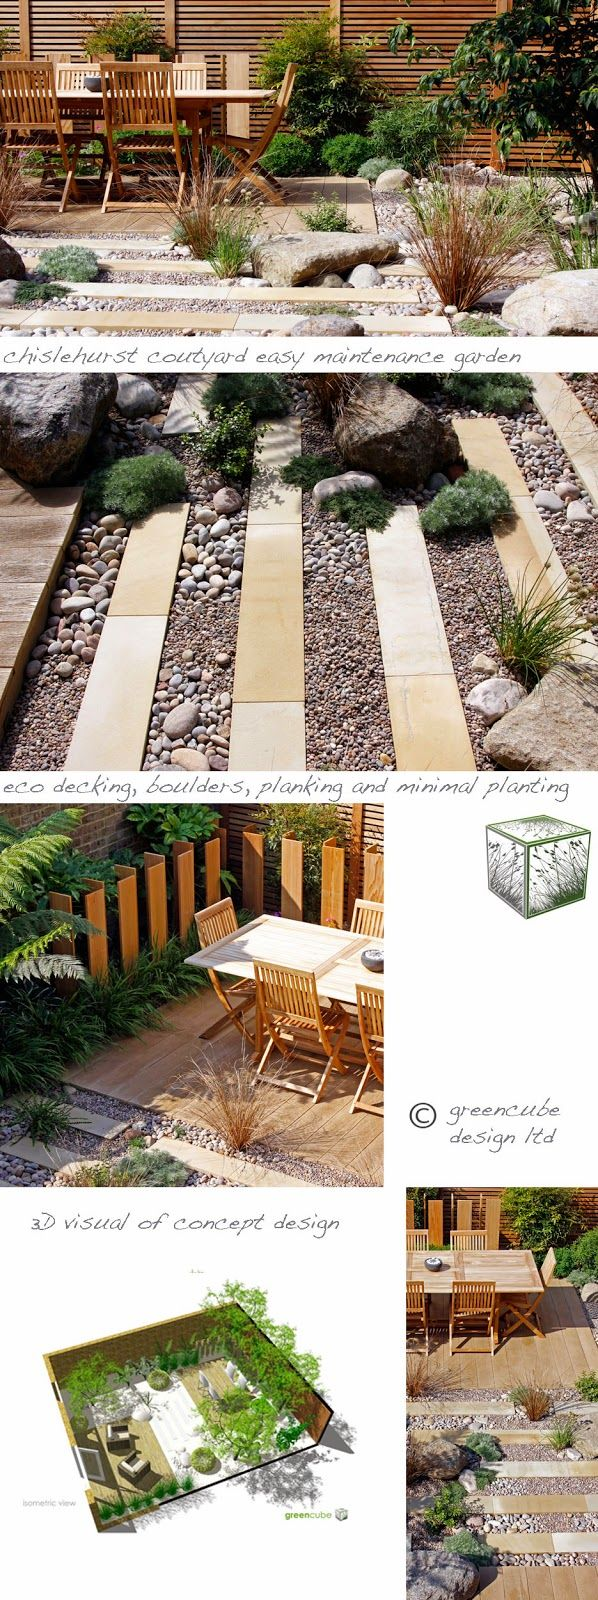 greencube garden and landscape design, UK: Great news for greencube - great garden design!